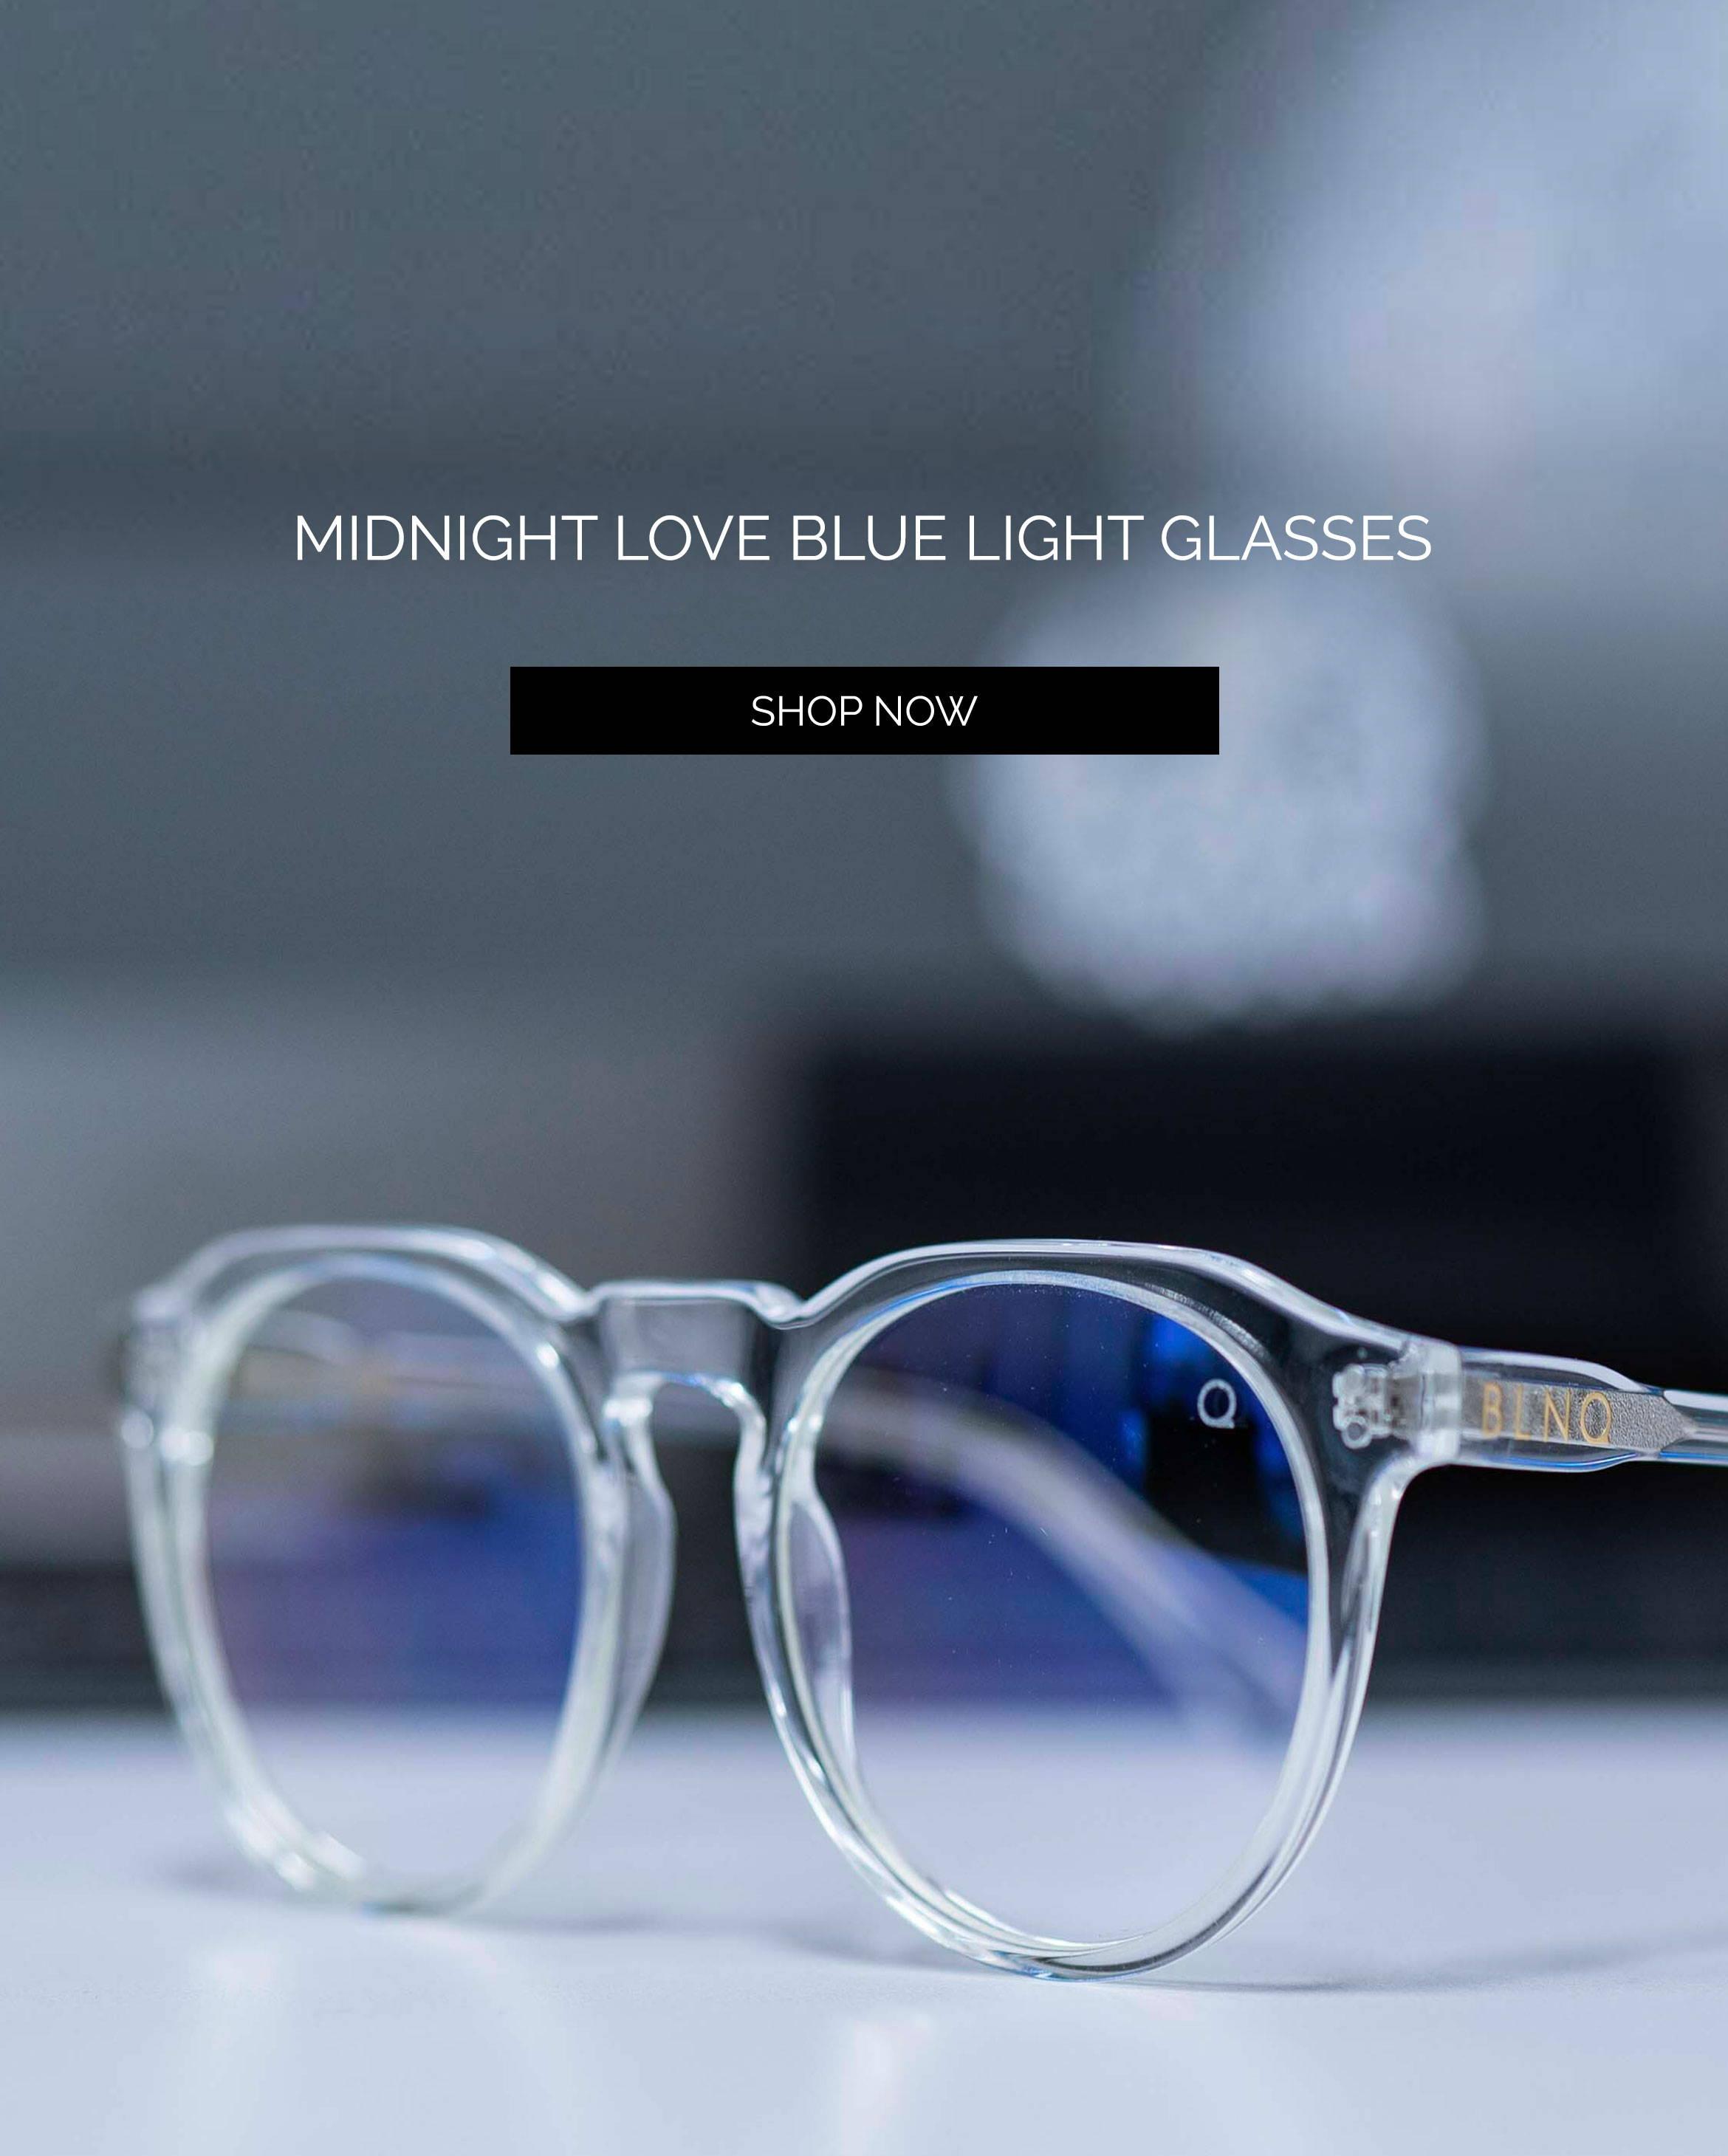 Midnight Love Blue Light Glasses